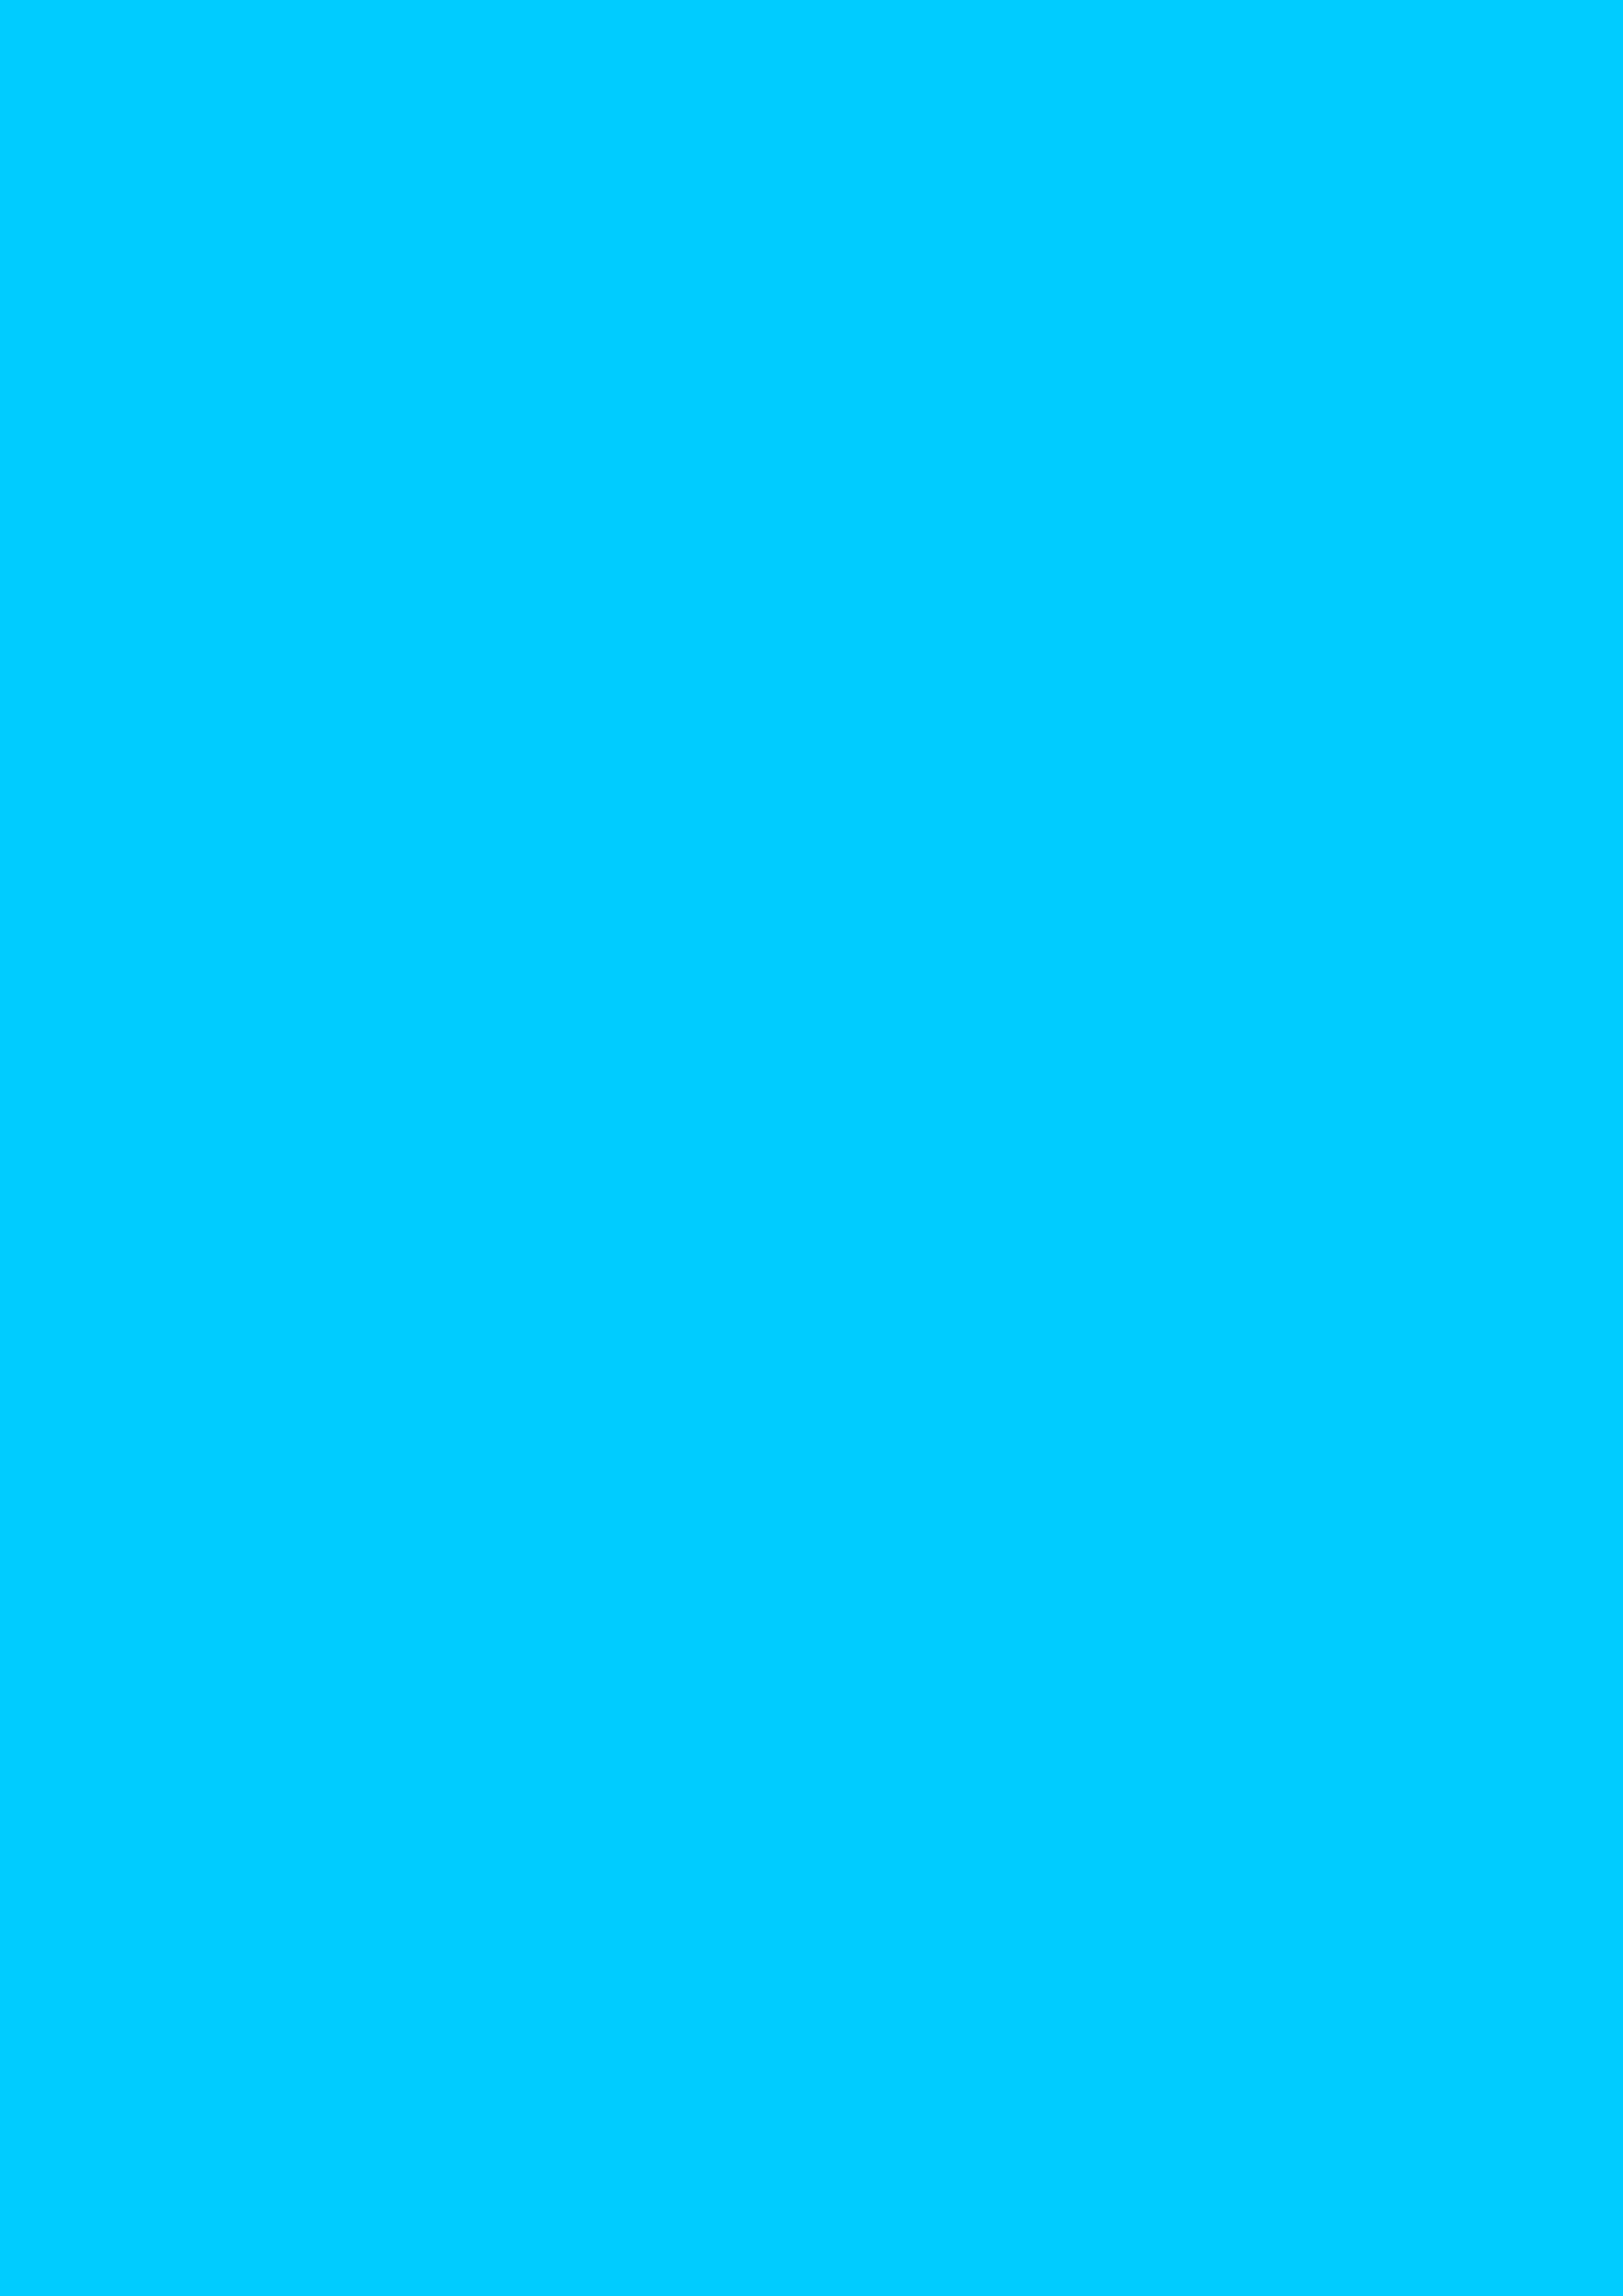 2480x3508 Vivid Sky Blue Solid Color Background